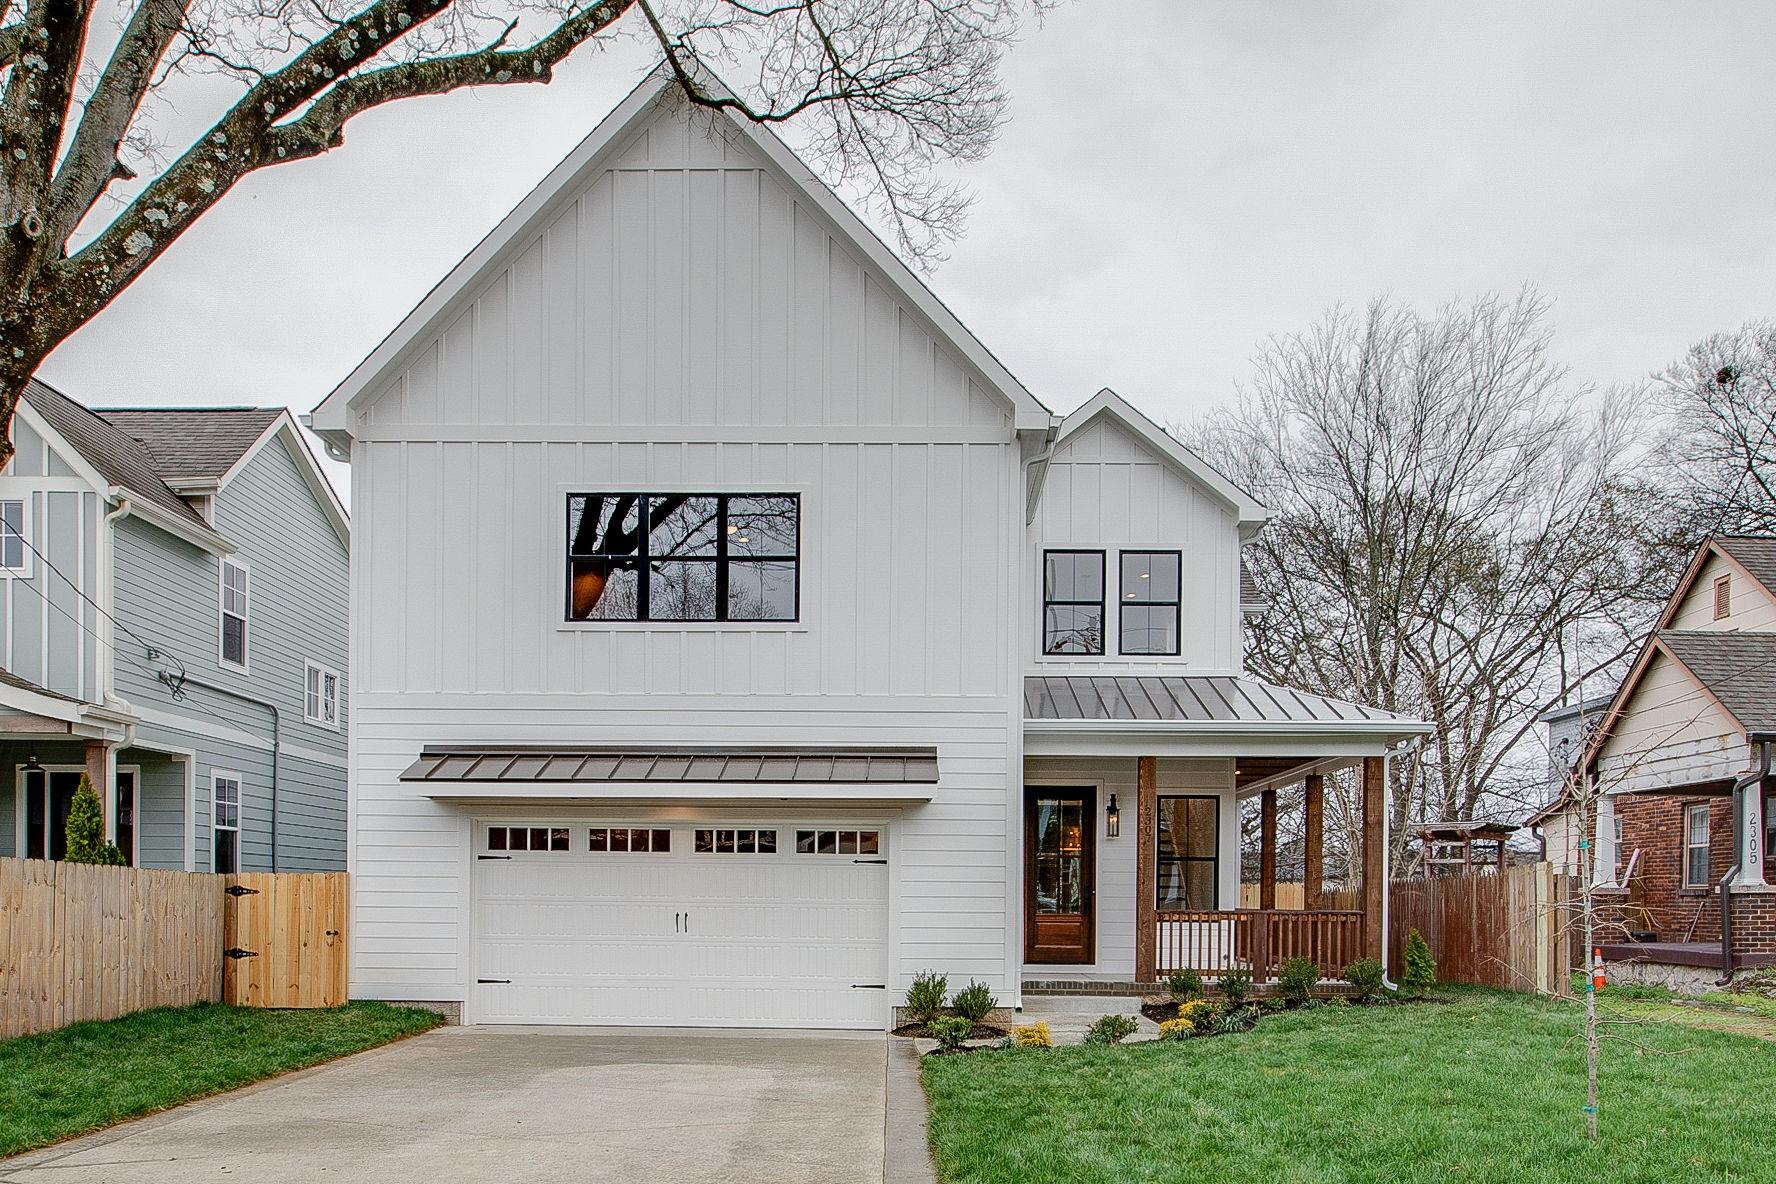 2307 Knowles Ave, Nashville, TN 37204 - Nashville, TN real estate listing